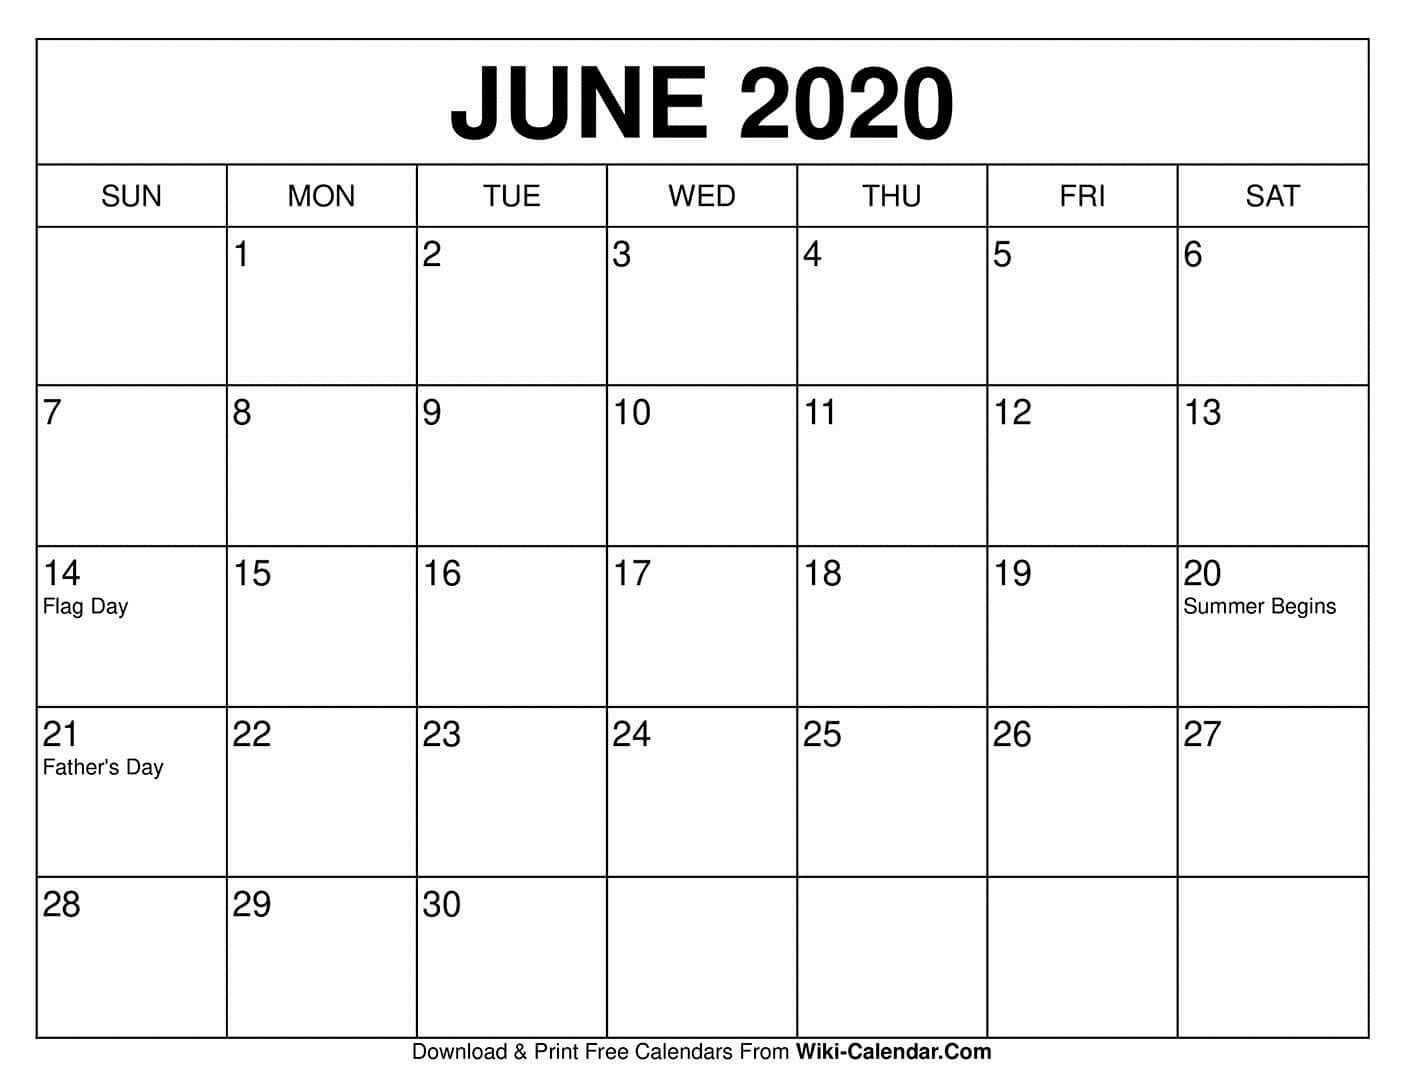 007 Shocking June 2020 Monthly Calendar Template Highest Clarity Full